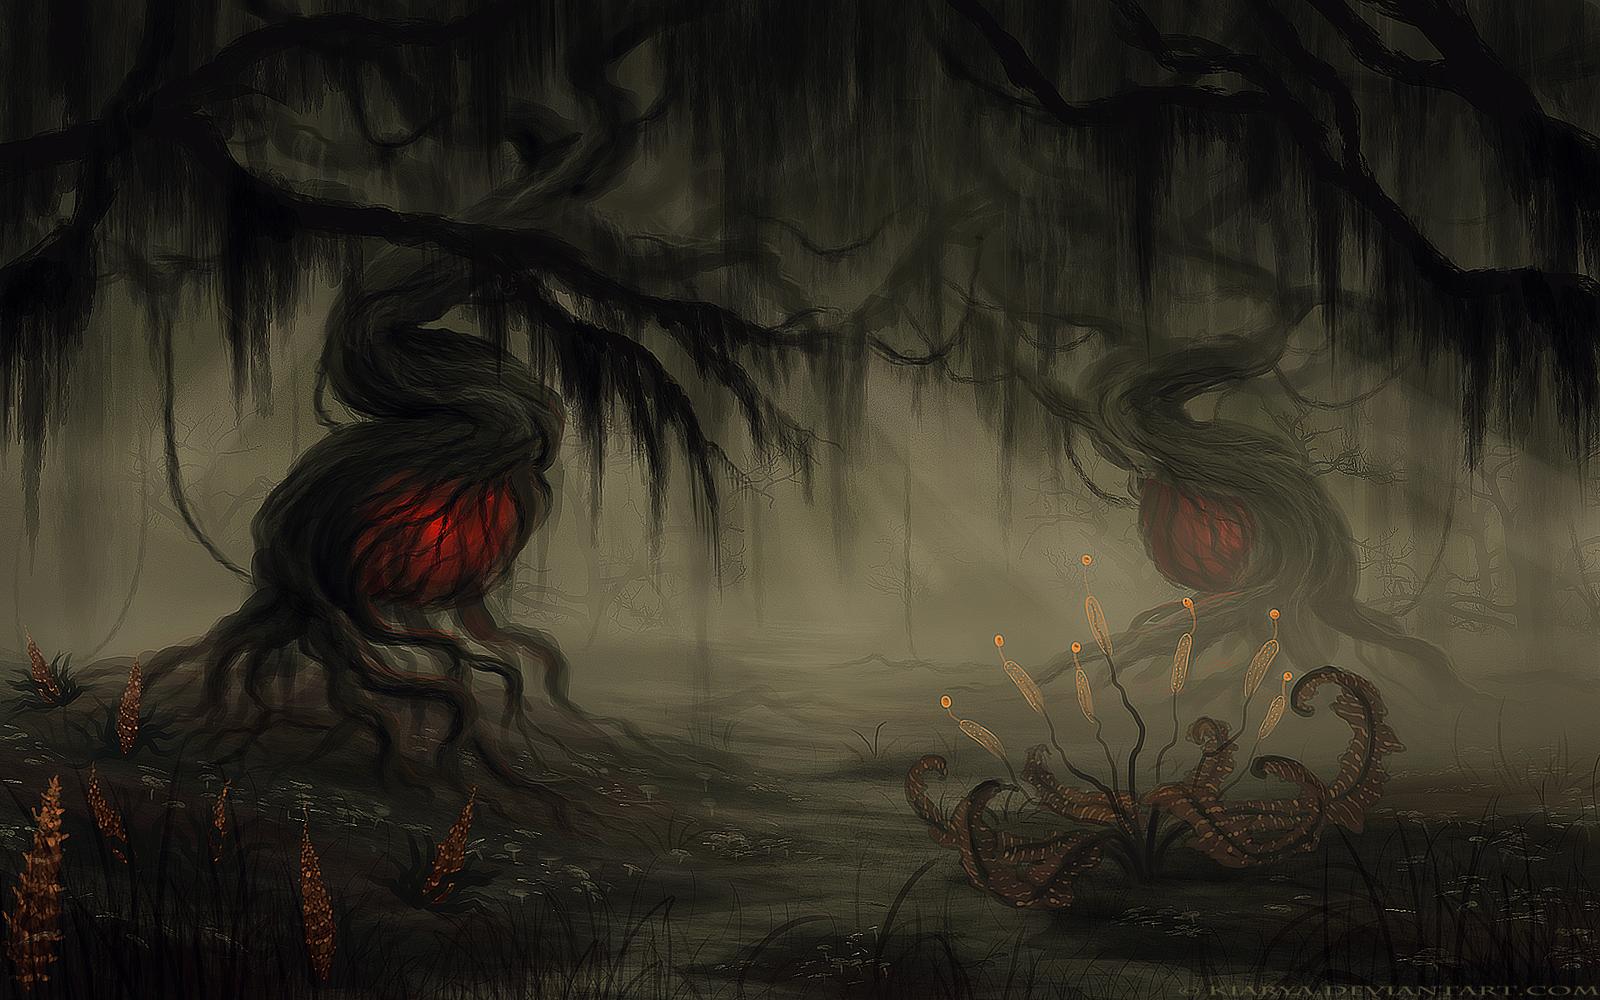 Planet Zapffe, The Swamp by Kiarya on DeviantArt